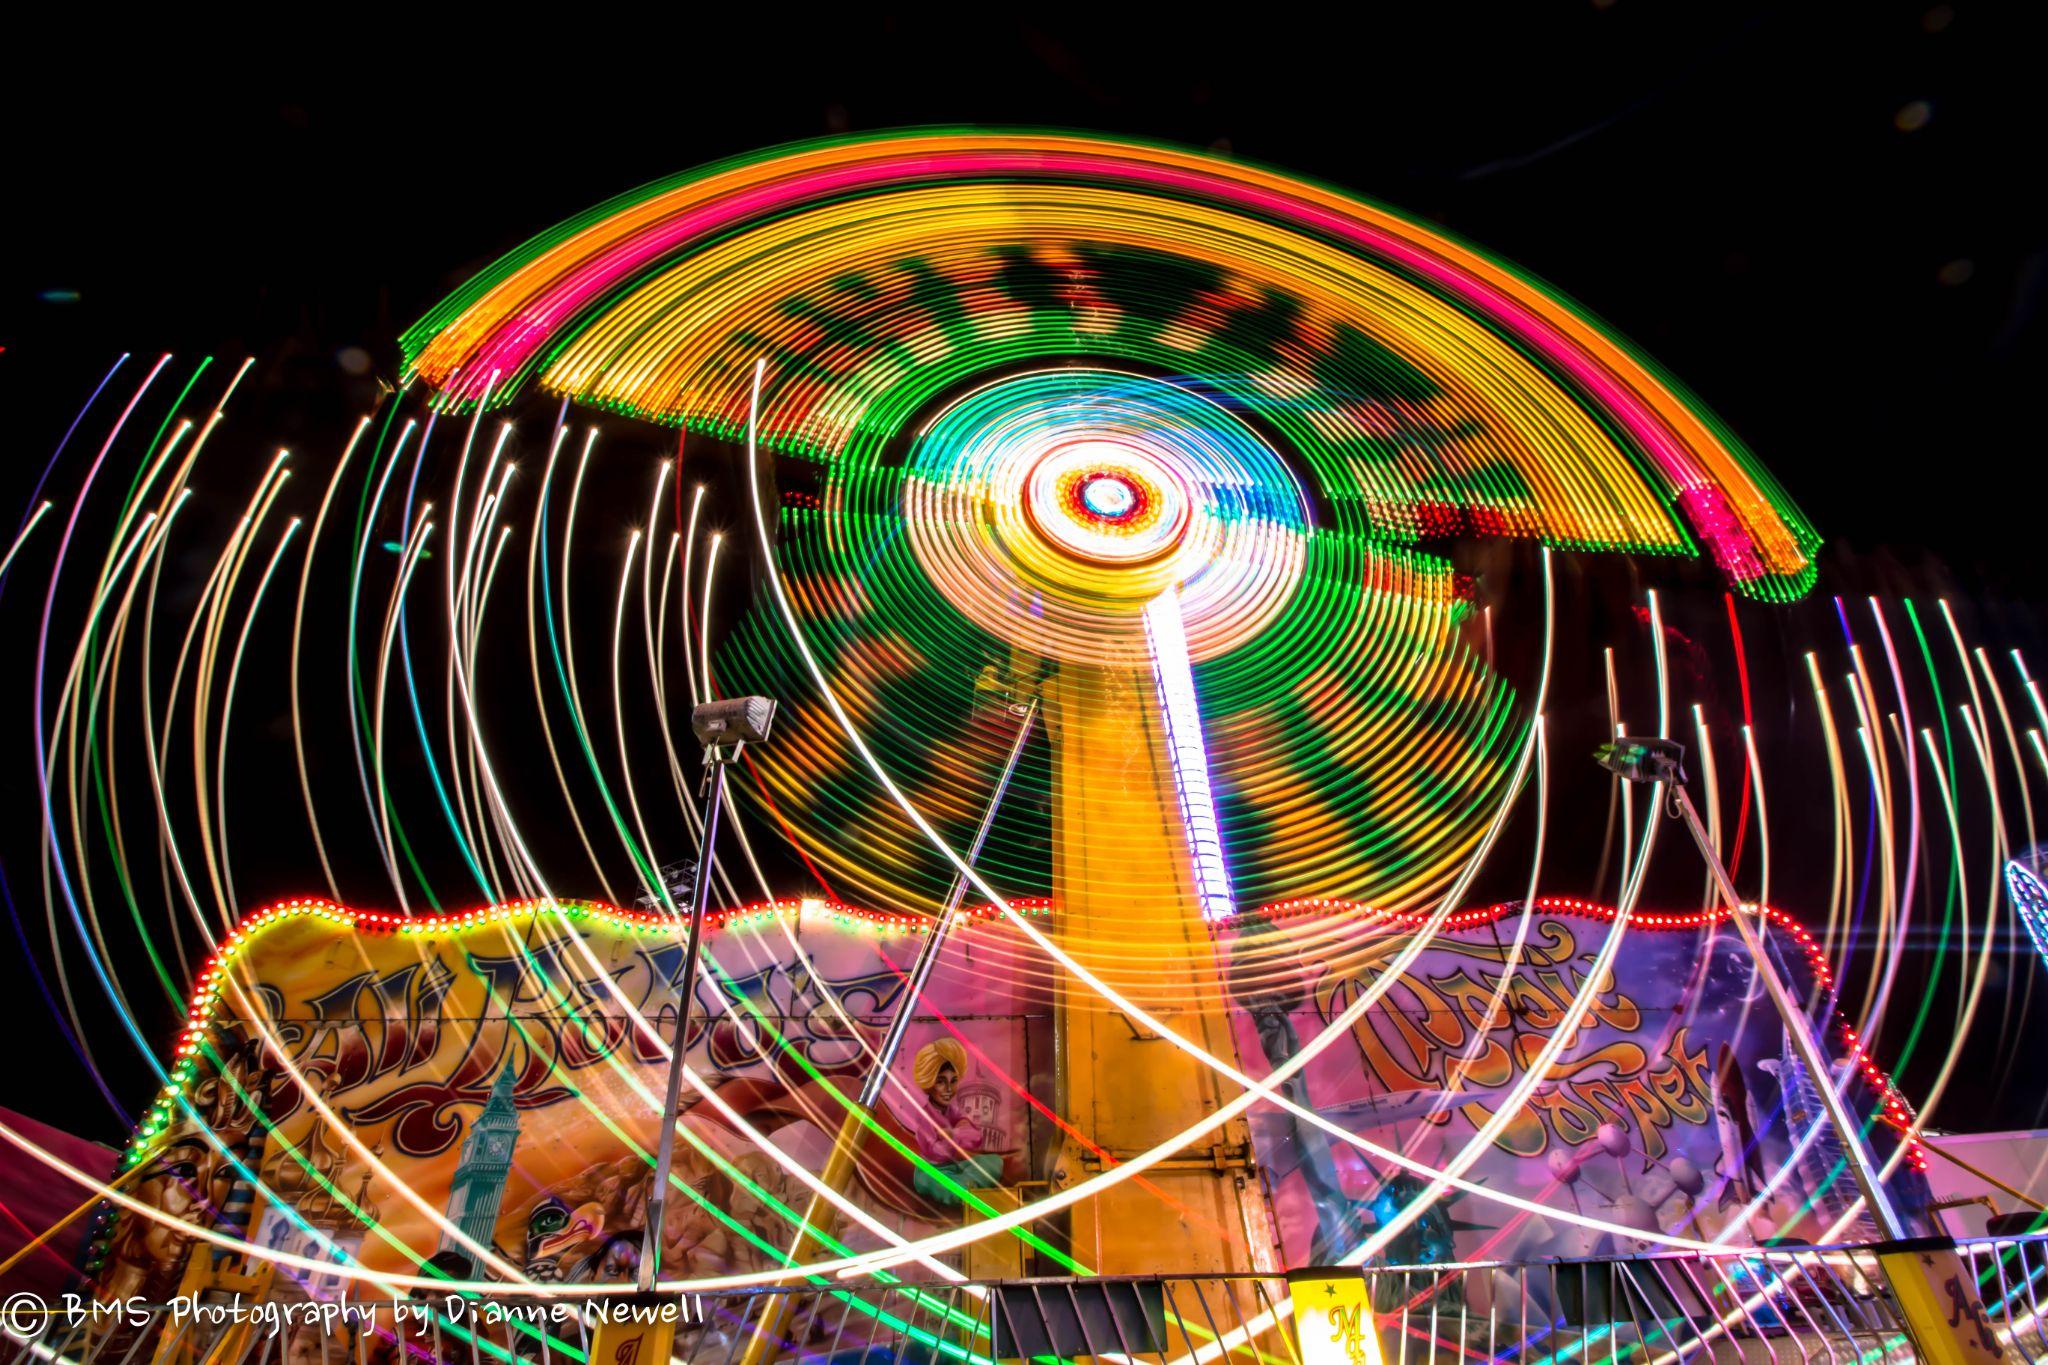 Rainbow lights by BMS Photography